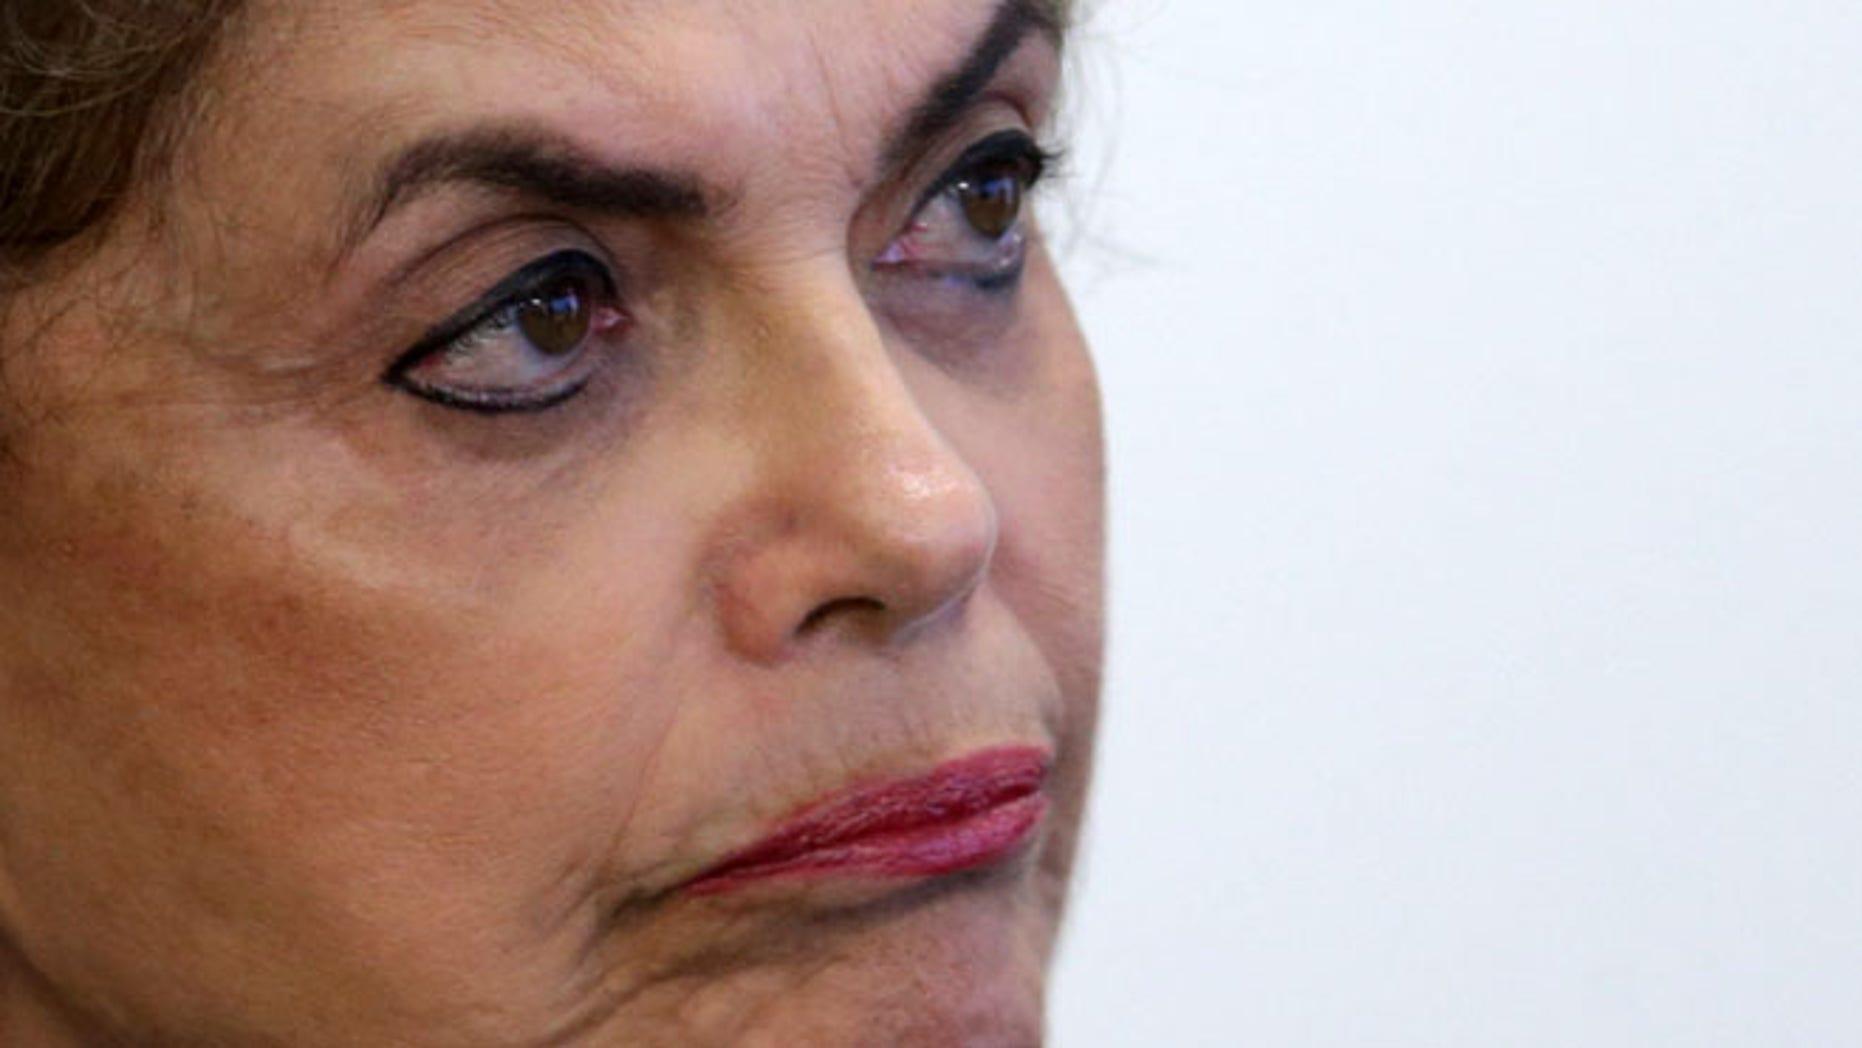 Brazil's President Dilma Rousseff at the Planalto Presidential Palace, in Brasilia, Brazil, Wednesday, April 13, 2016.